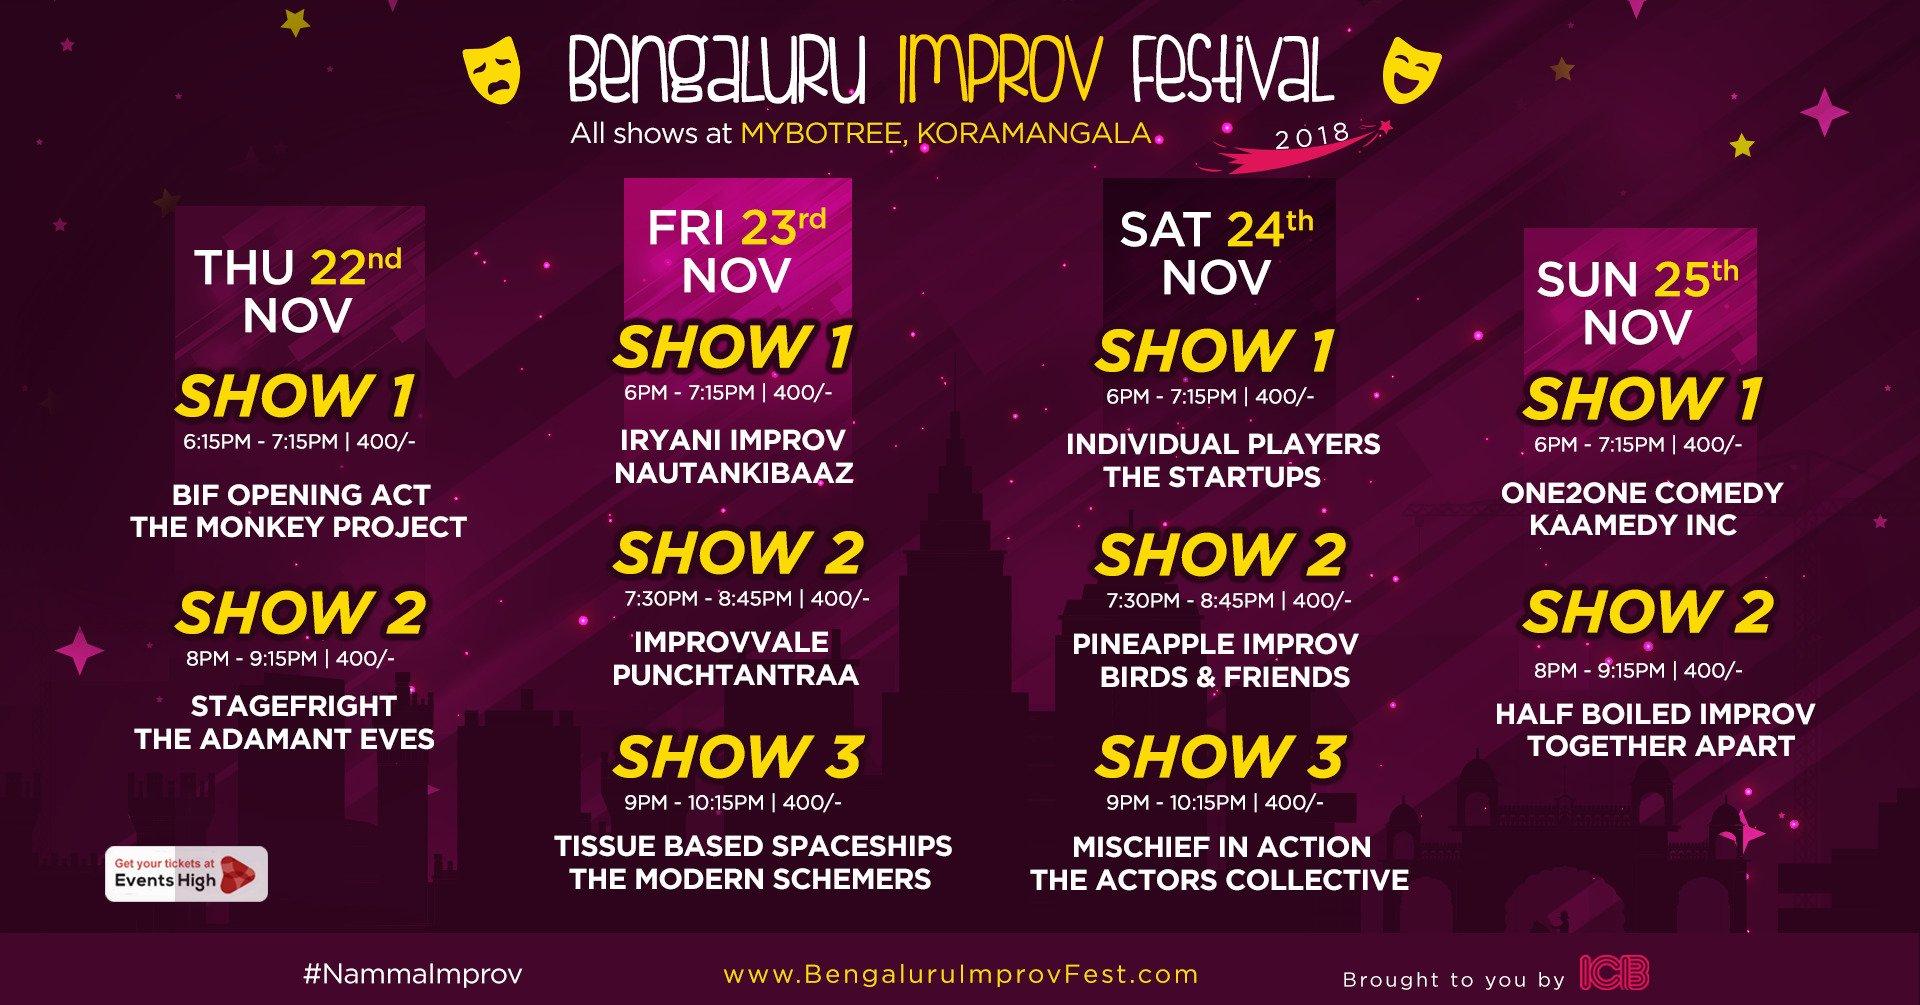 Bengaluru Improv Festival